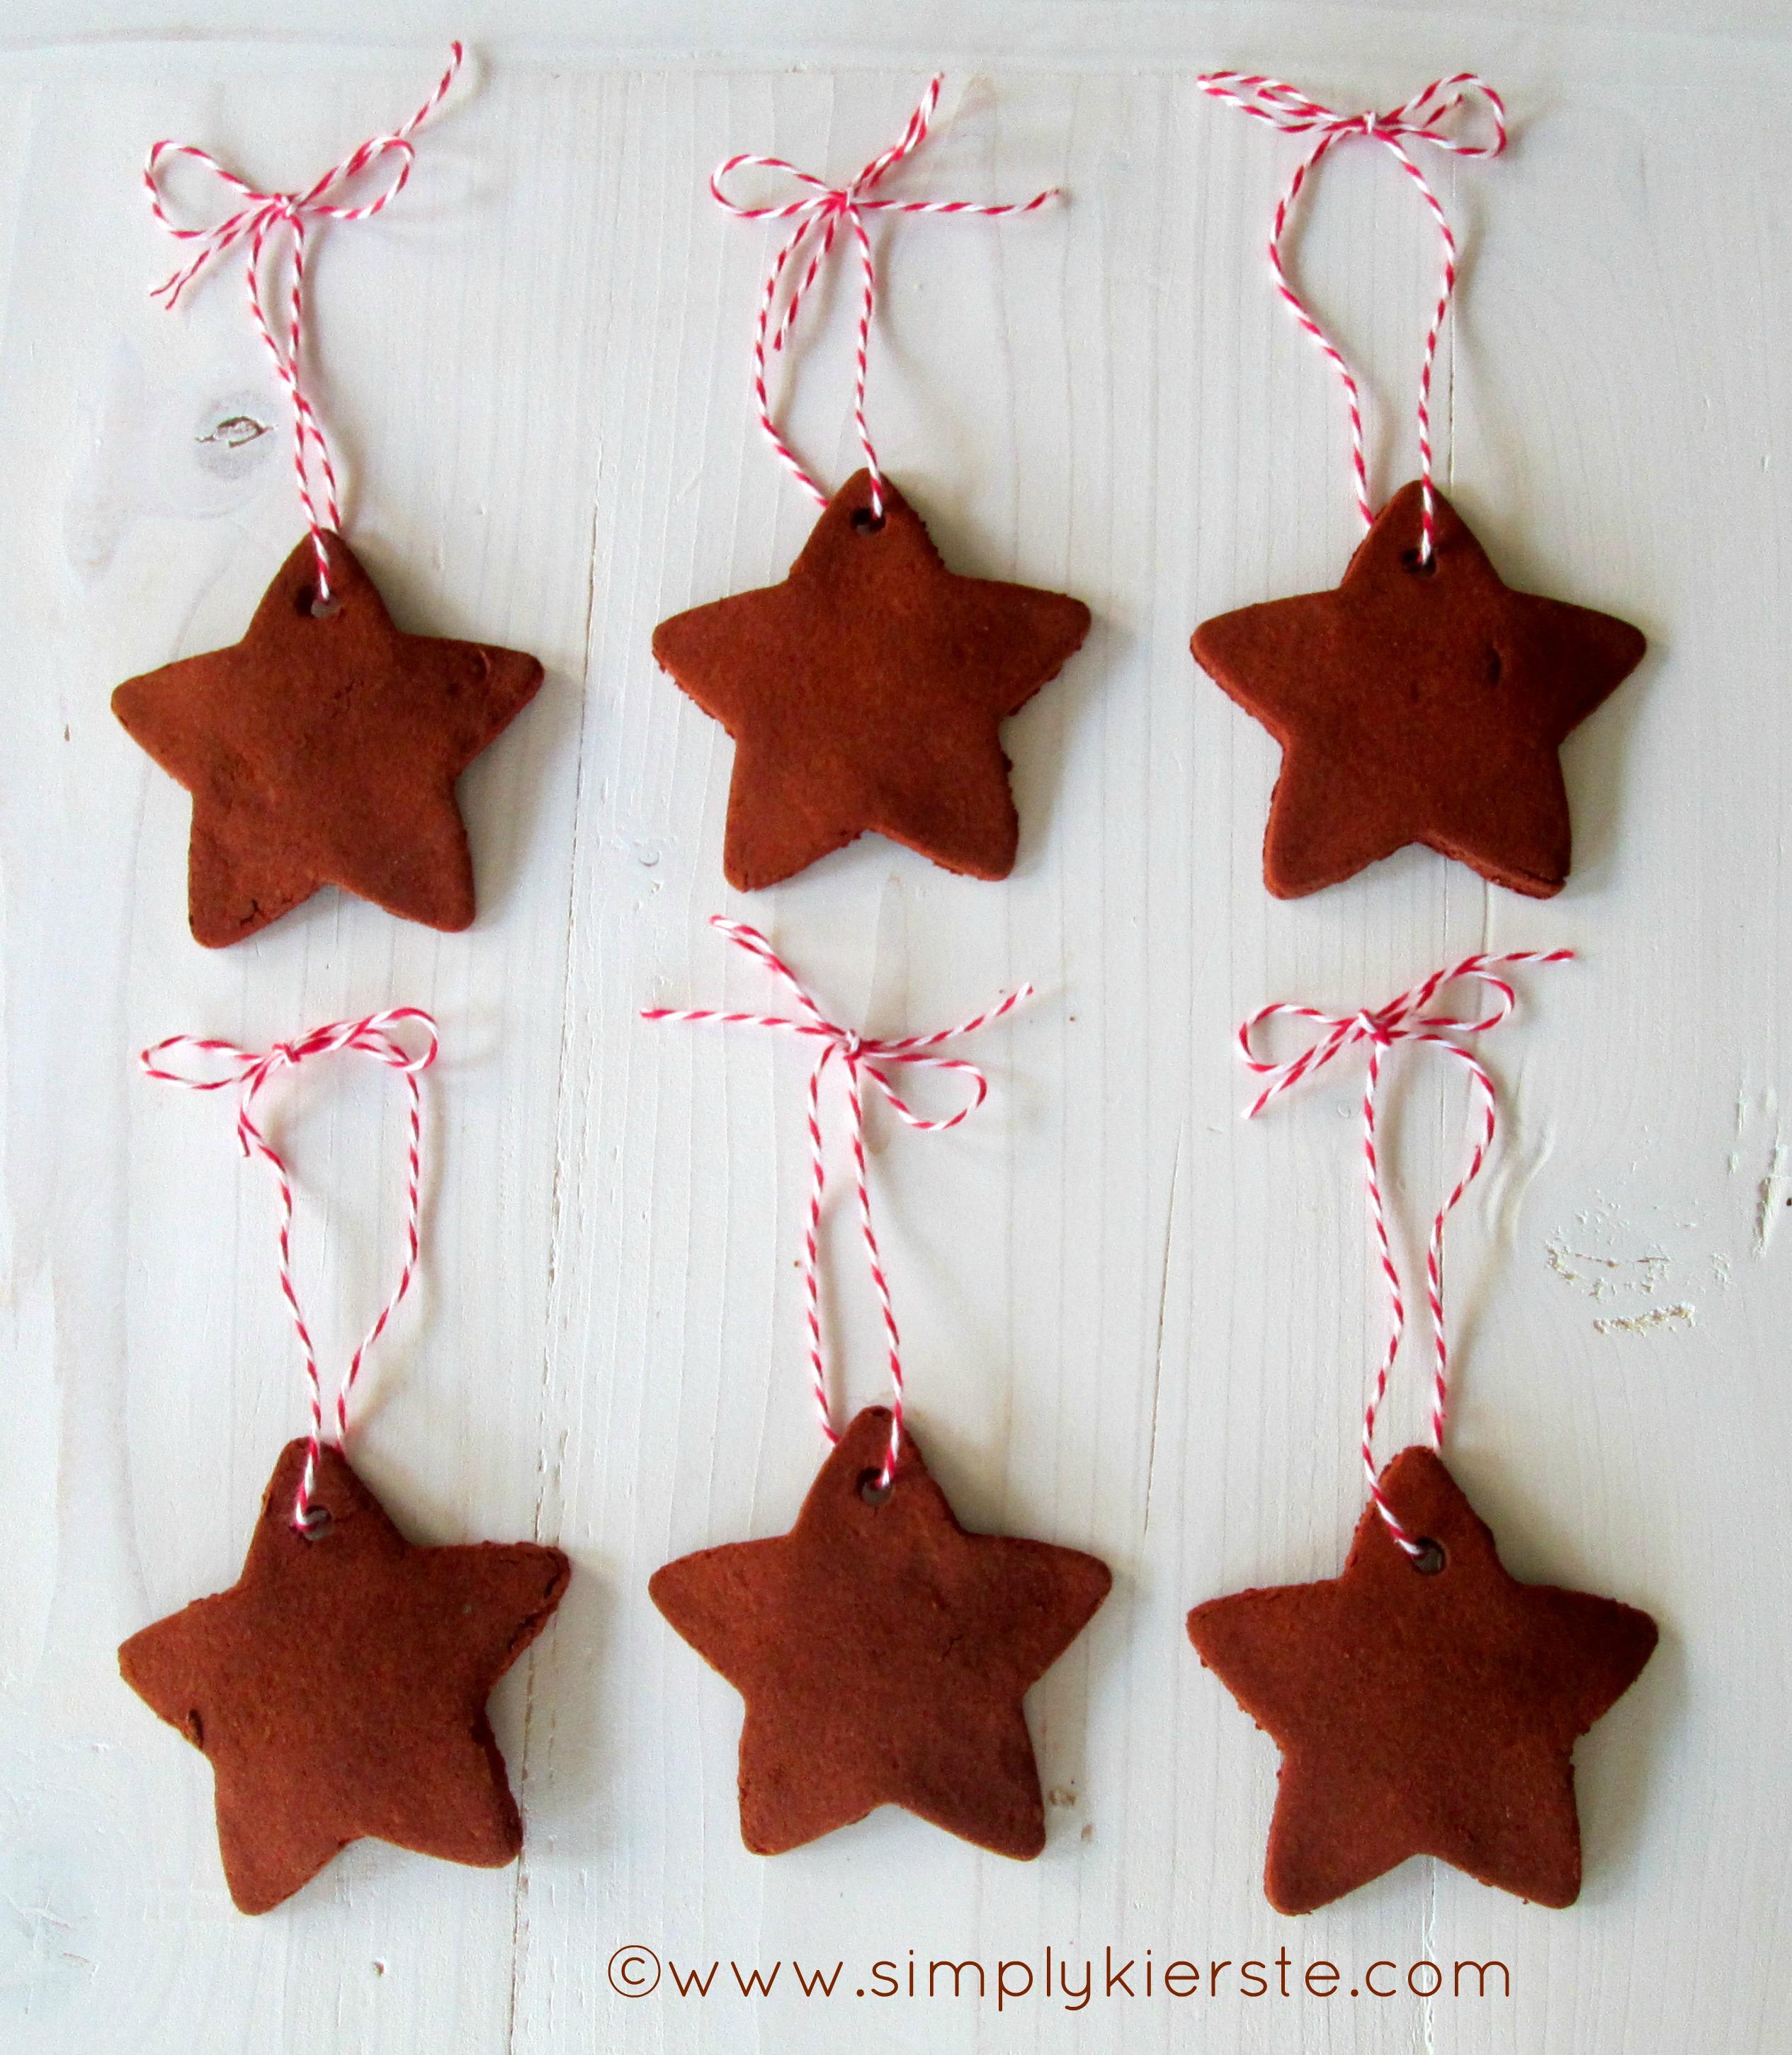 Homemade Christmas Ornaments Dough Cinnamon : Handmade cinnamon ornaments simplykierste